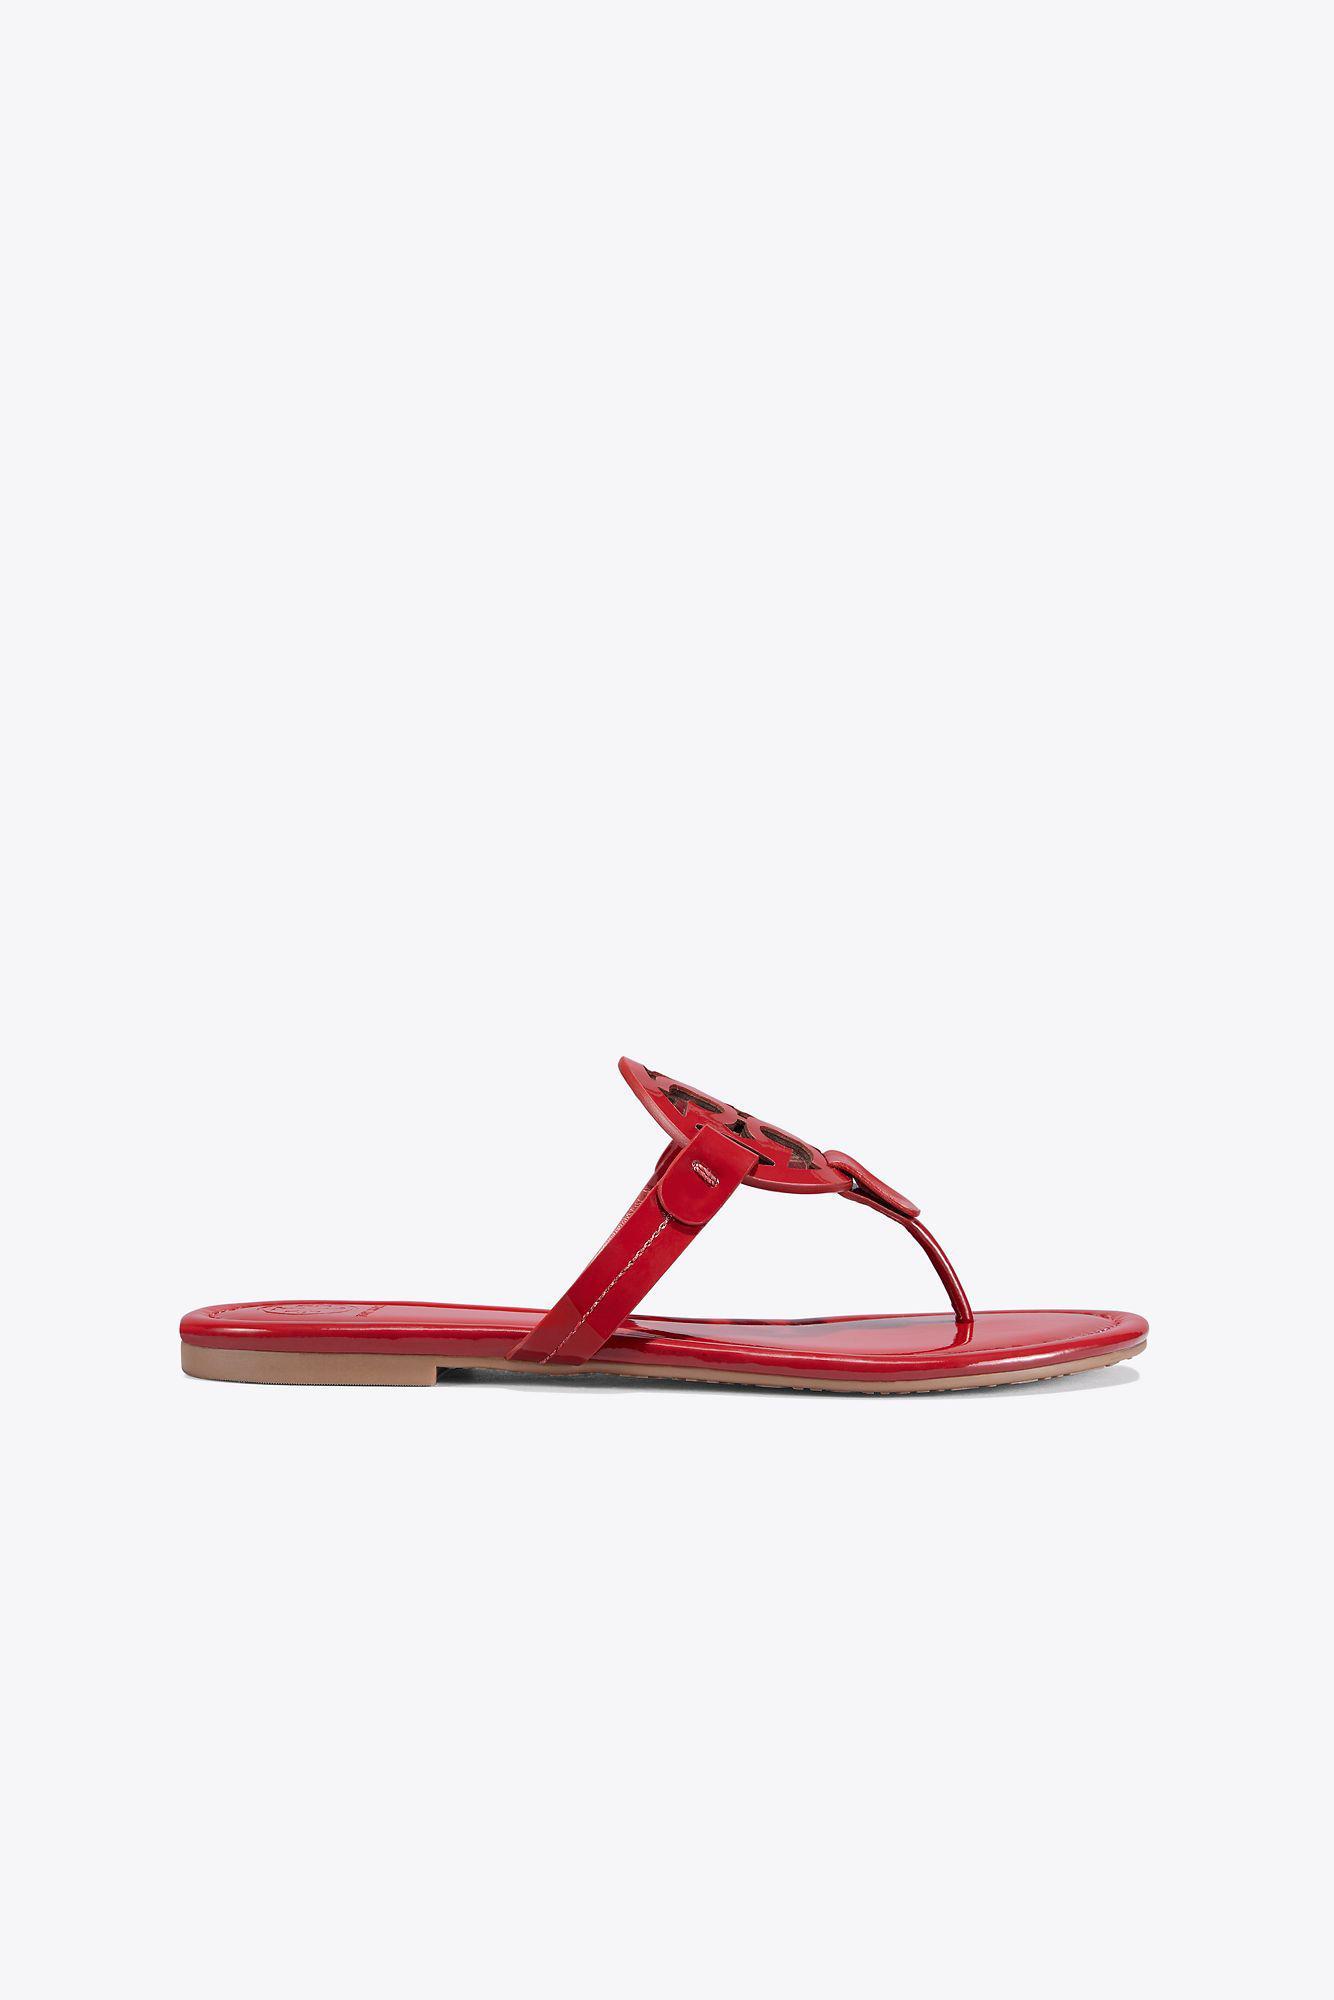 3ac19f09519 Tory Burch. Women s Red Miller Sandal